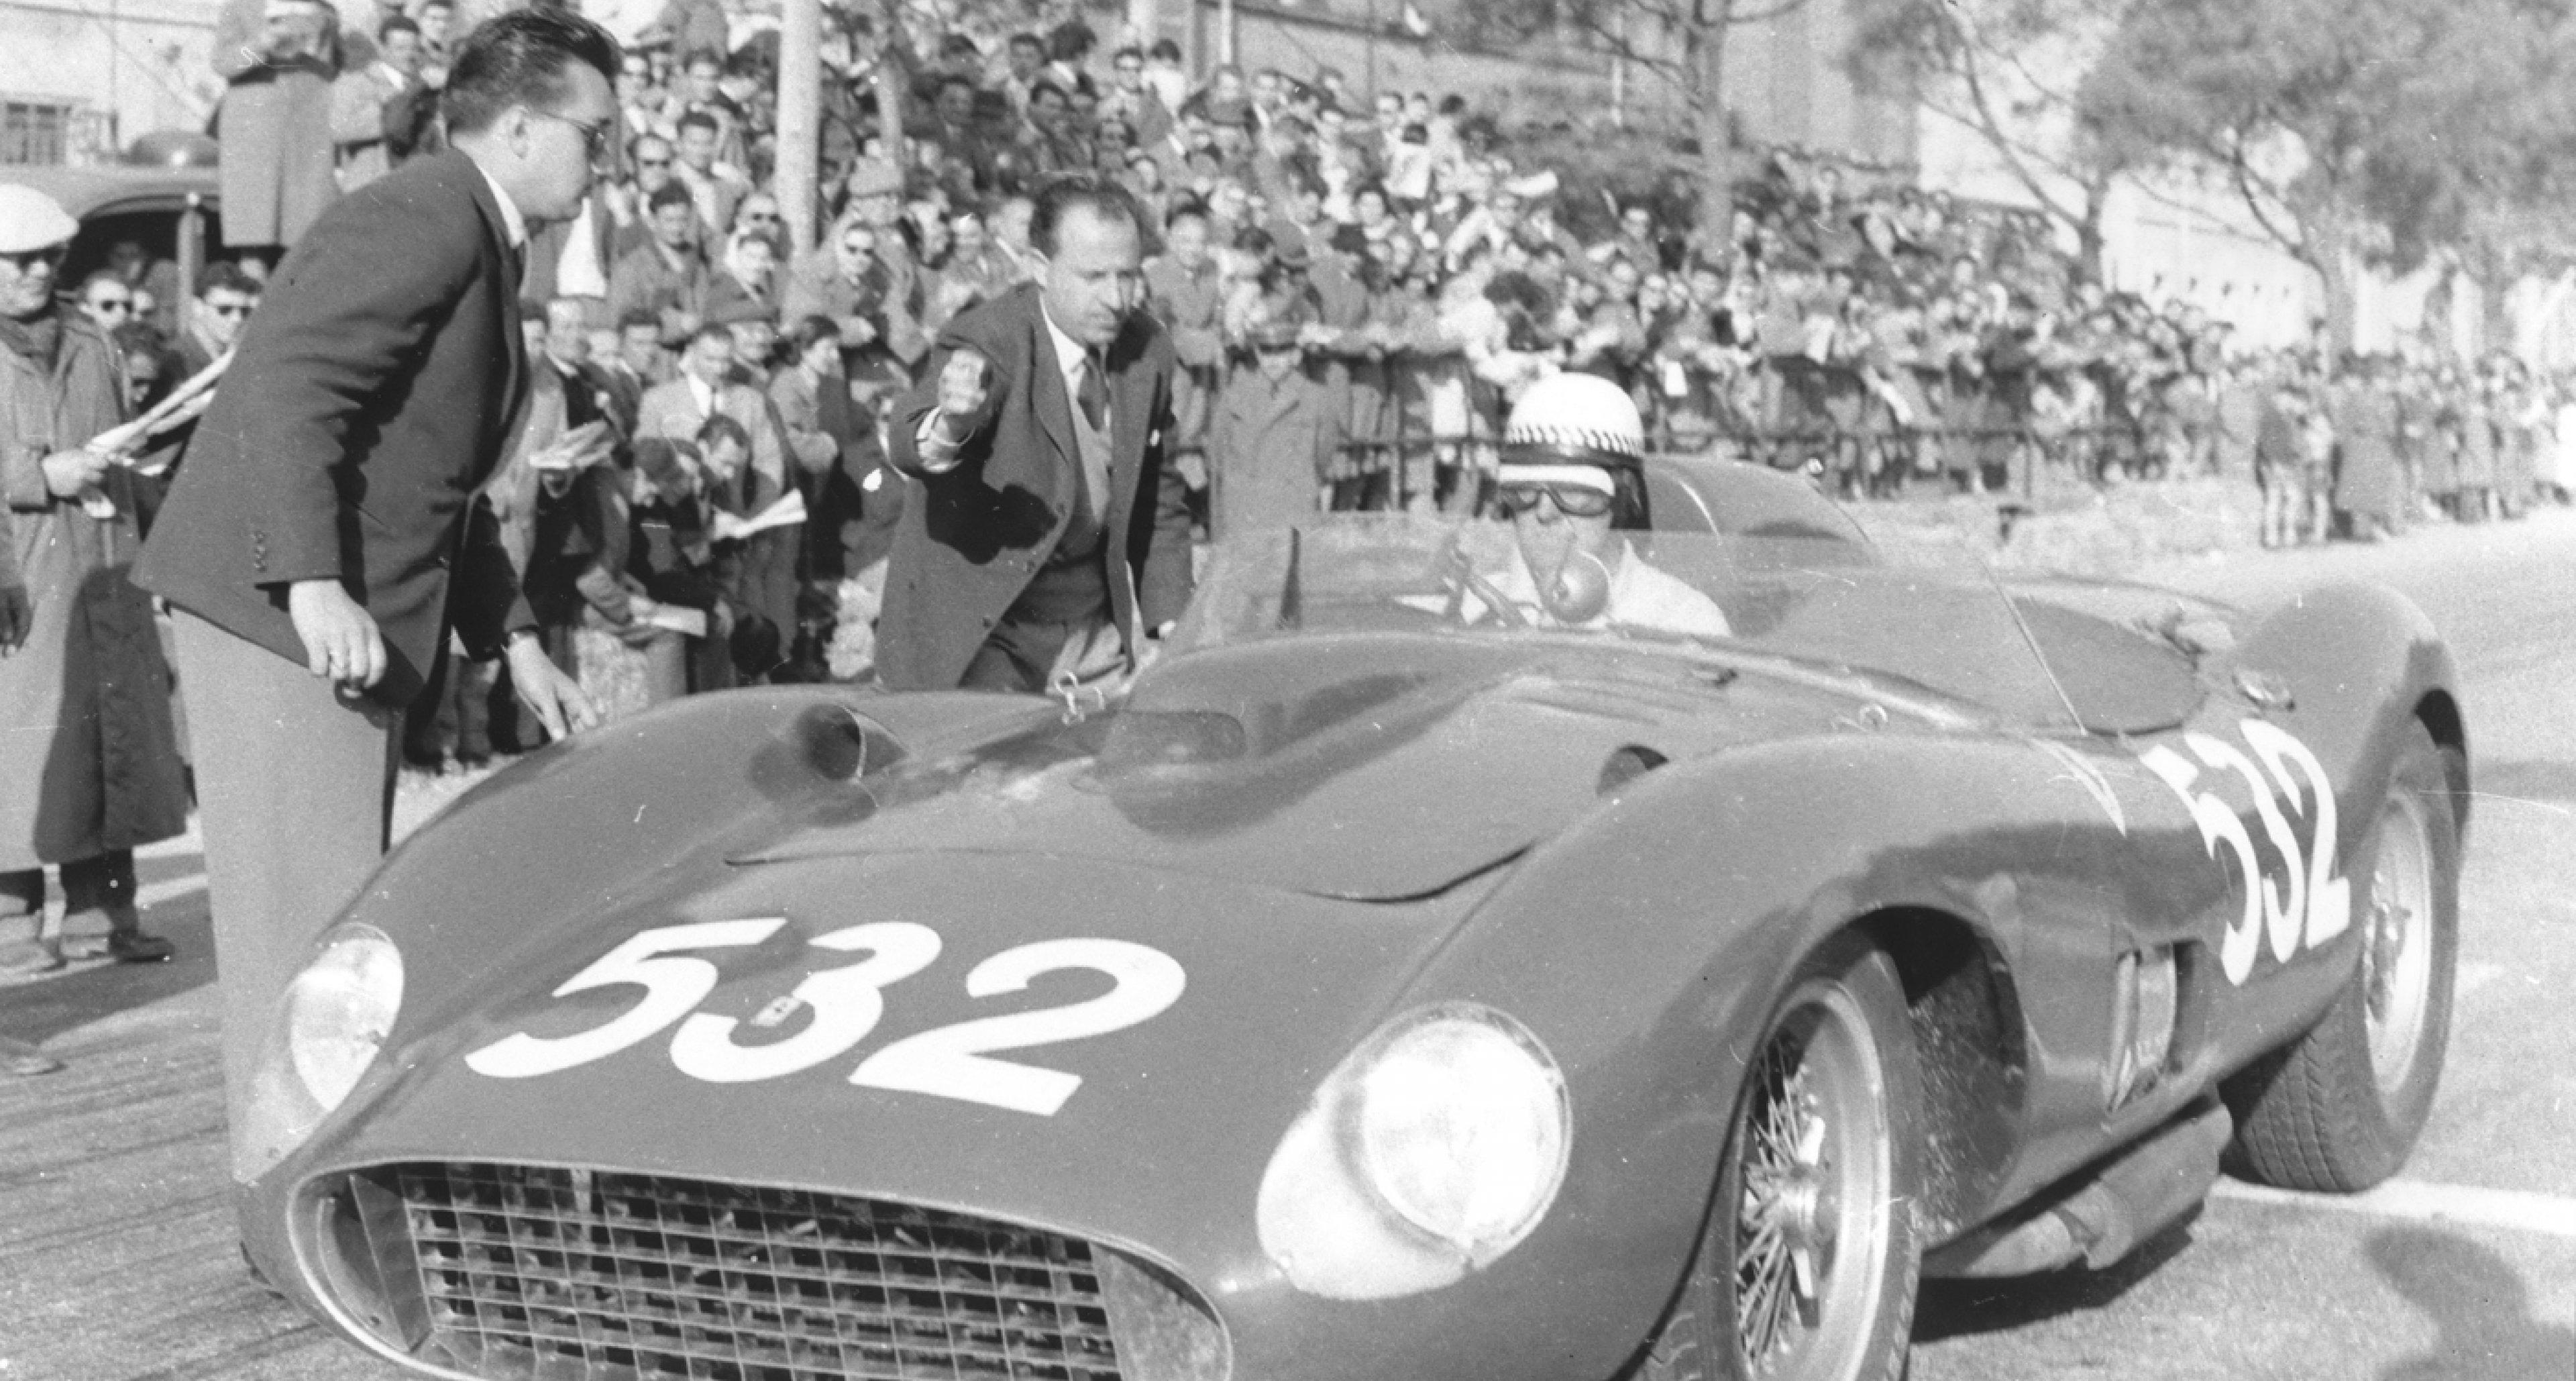 1957 Ferrari 335 S Scaglietti Spider, chassis 0674, estimate 28 - 32 M€ / 30 – 34 M$ Wolfgang von Trips, Mille Miglia 1957 © Ted Walker, Ferret Fotographic